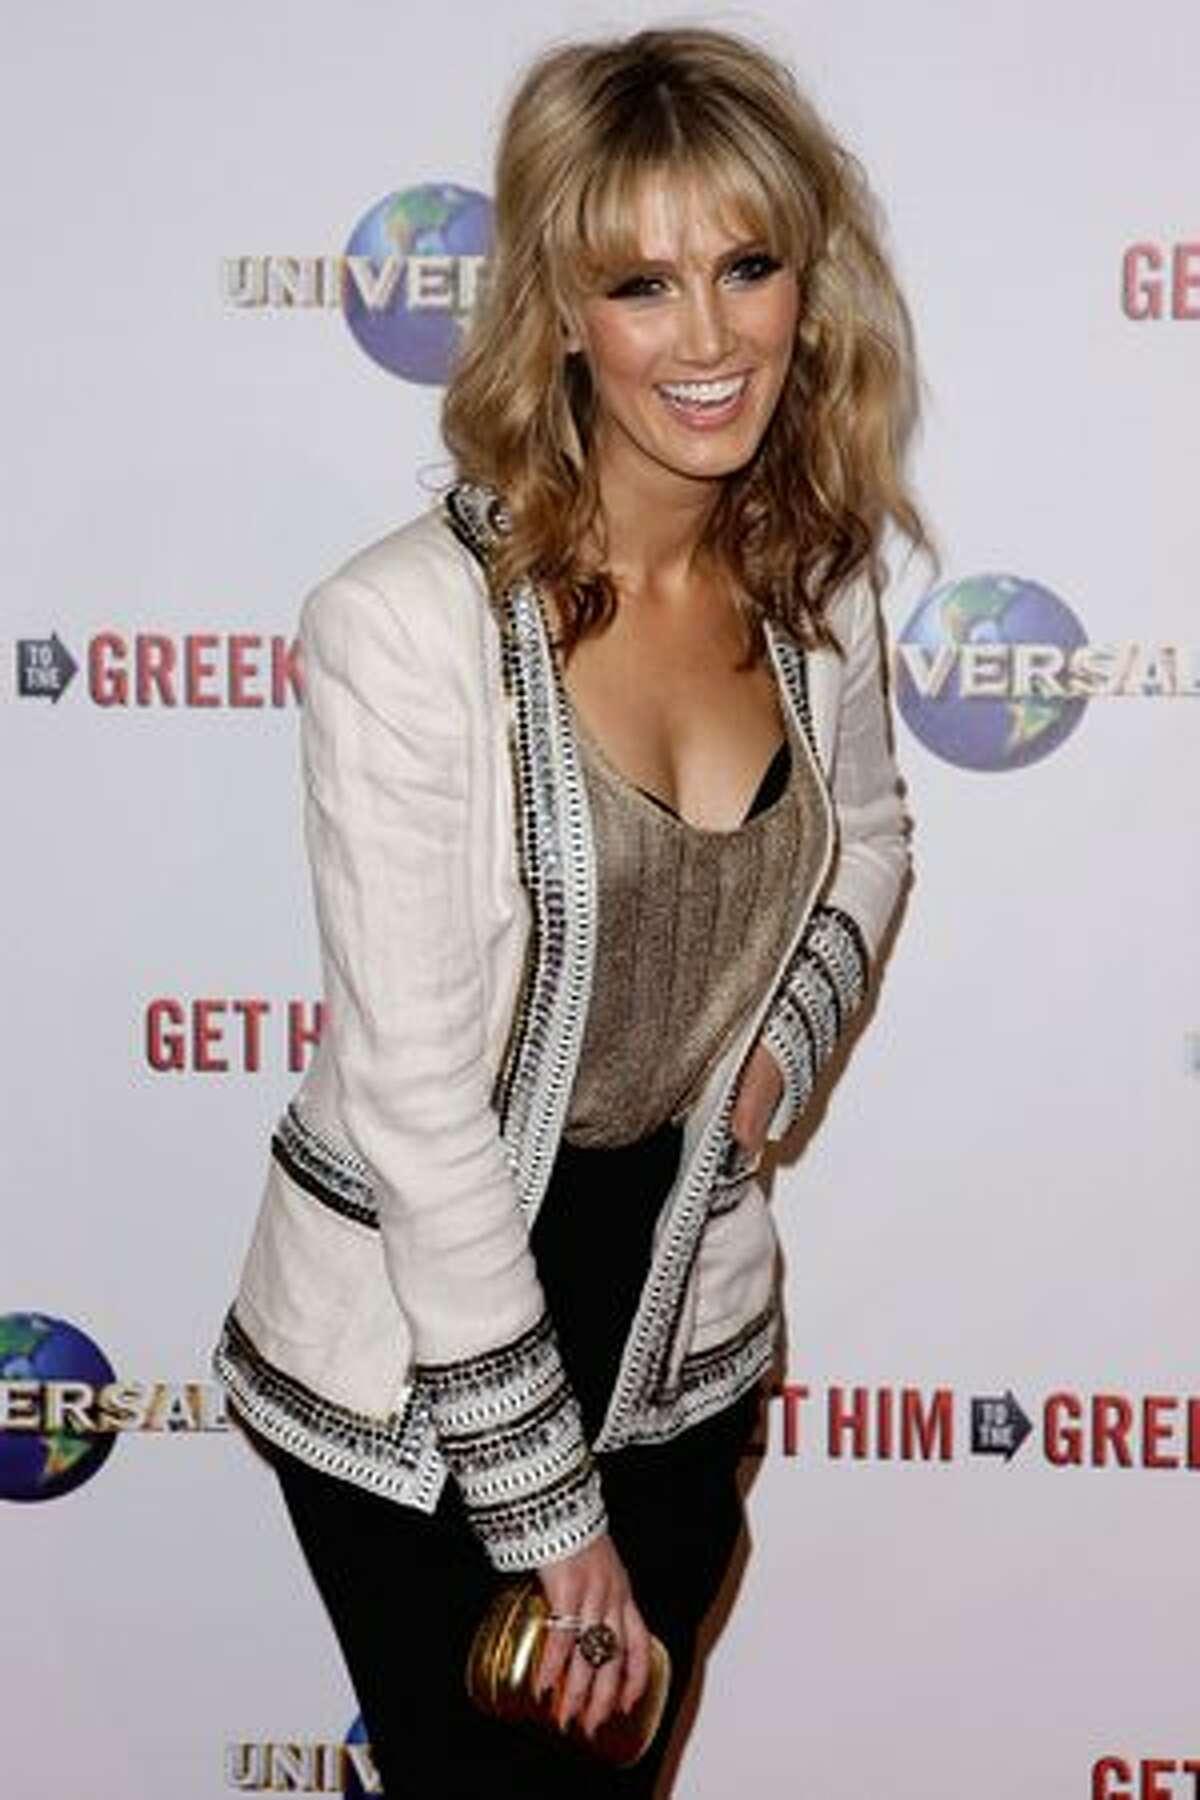 Delta Goodrem arrives at the premiere of